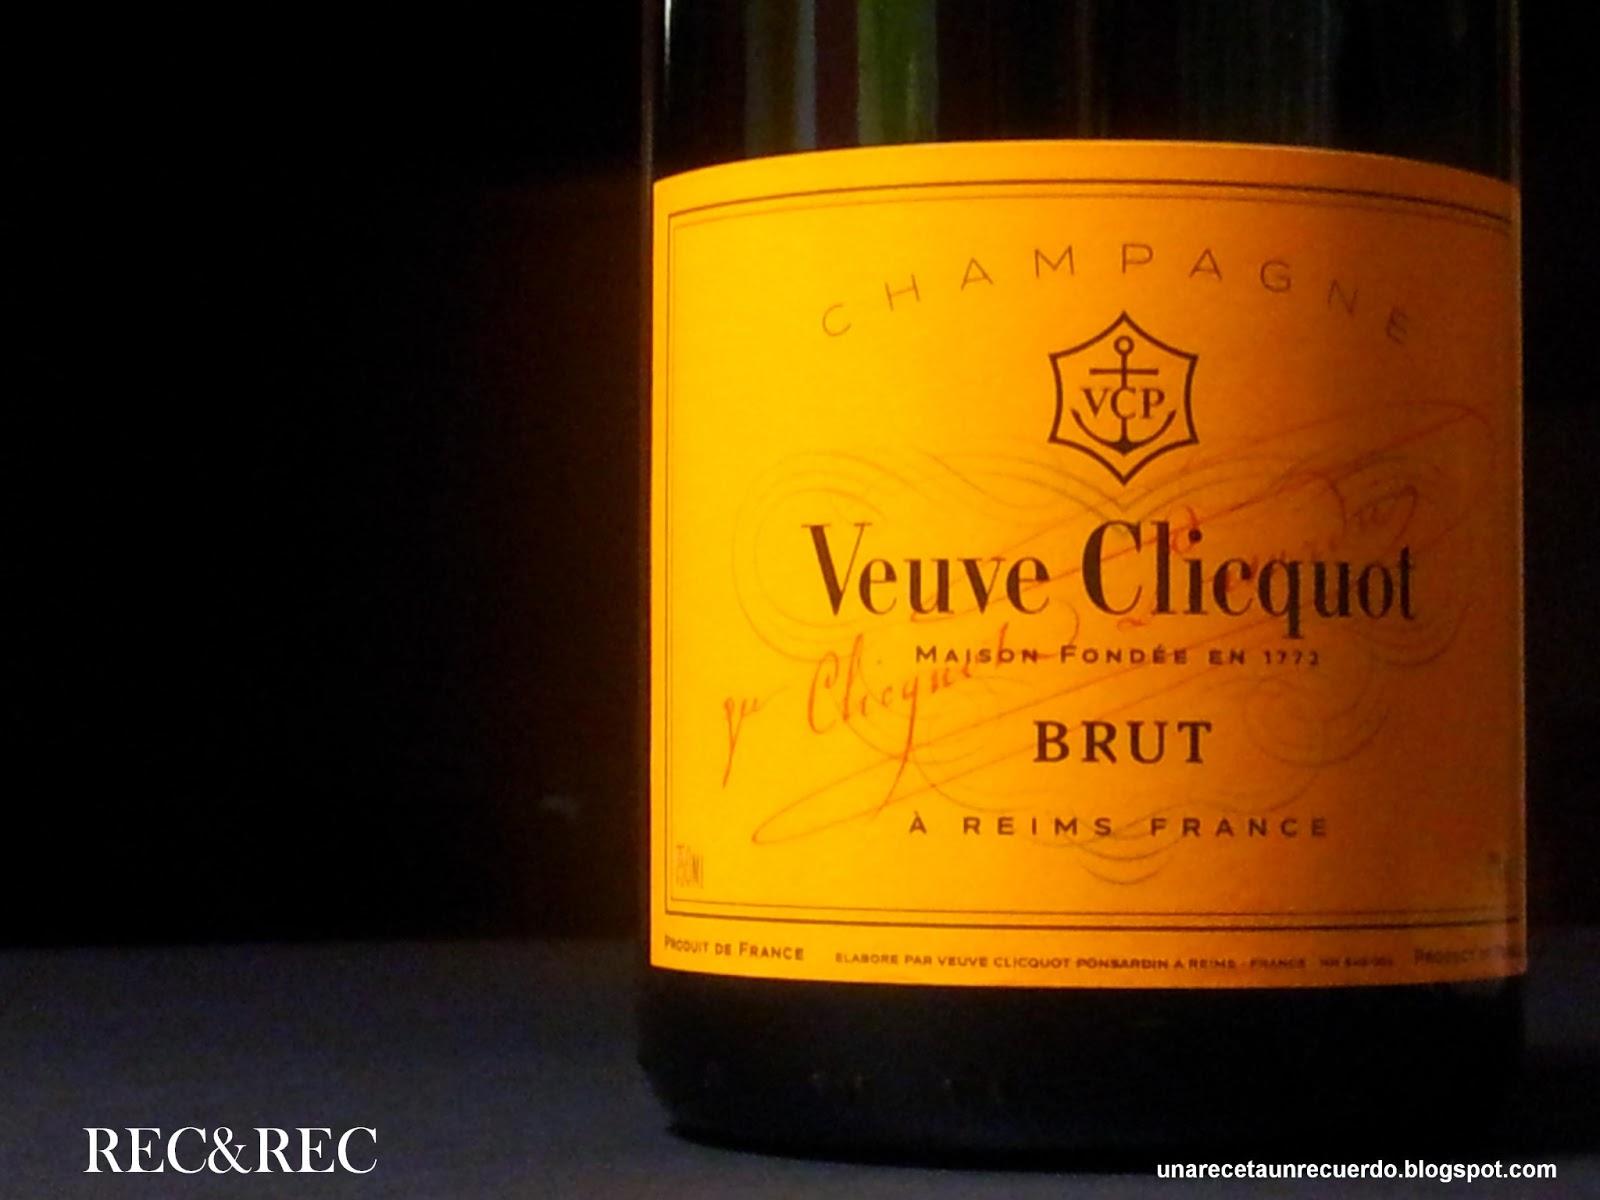 Champagne Veuve Clicquot Ponsardin Una Verdadera Joya